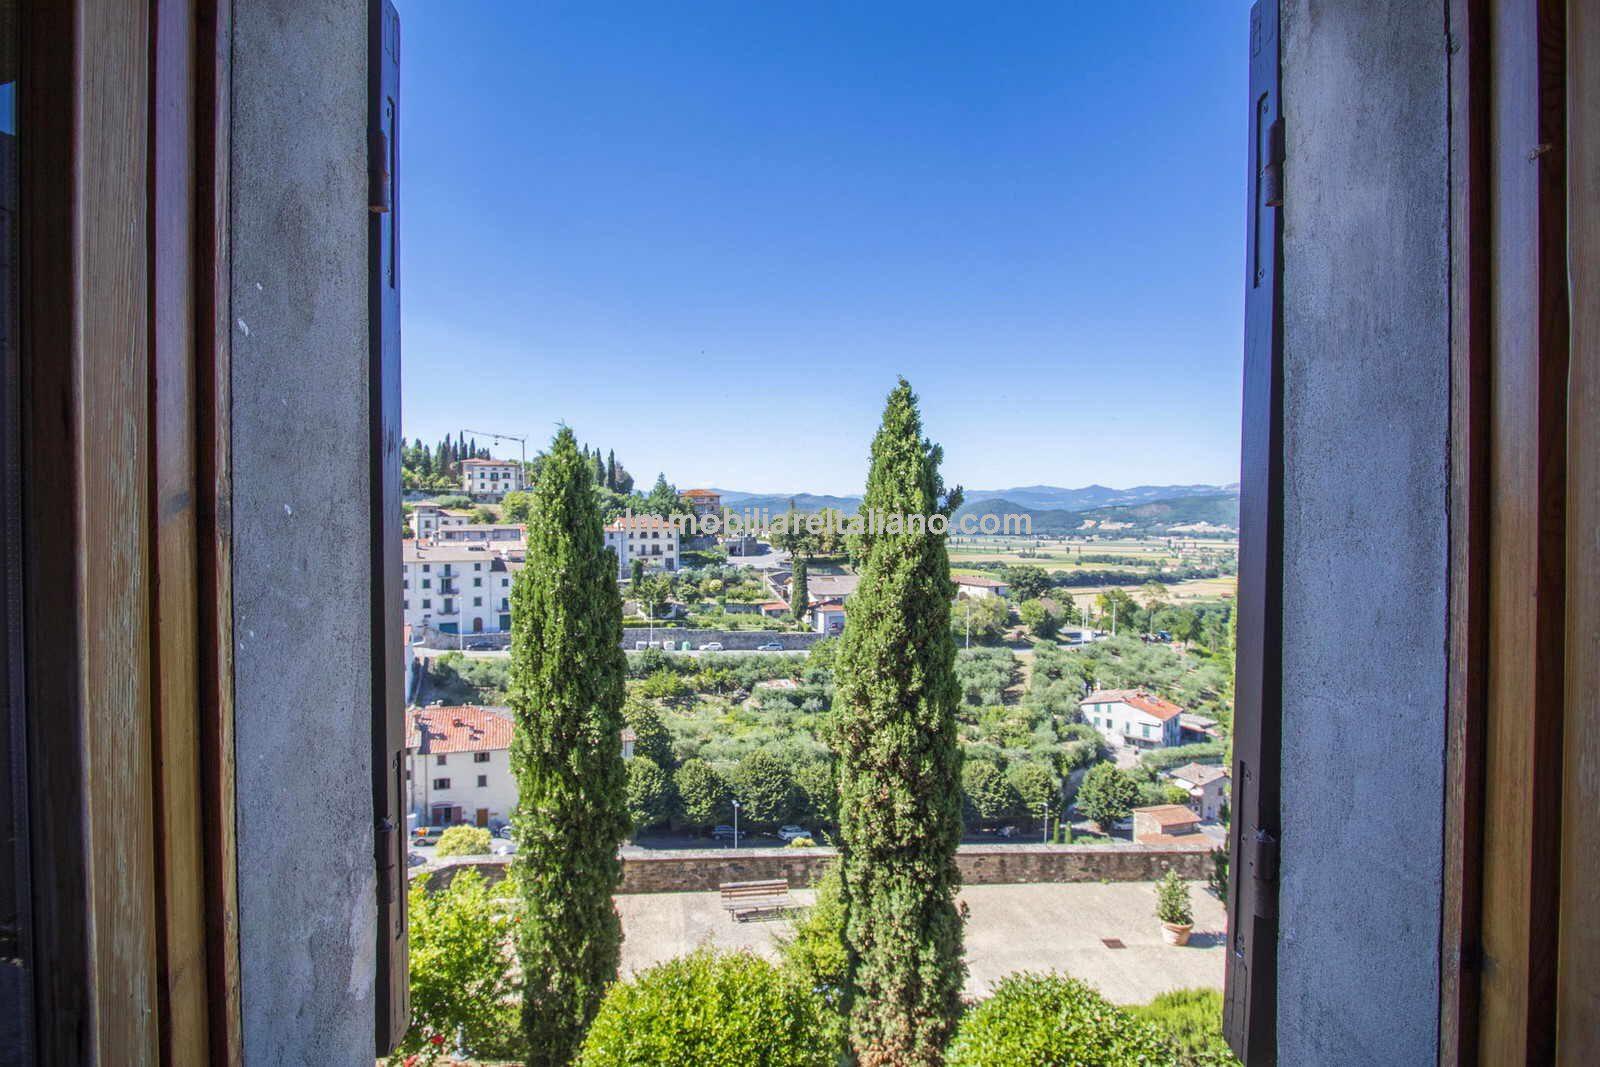 Panoramic view from Anghiari townhouse window